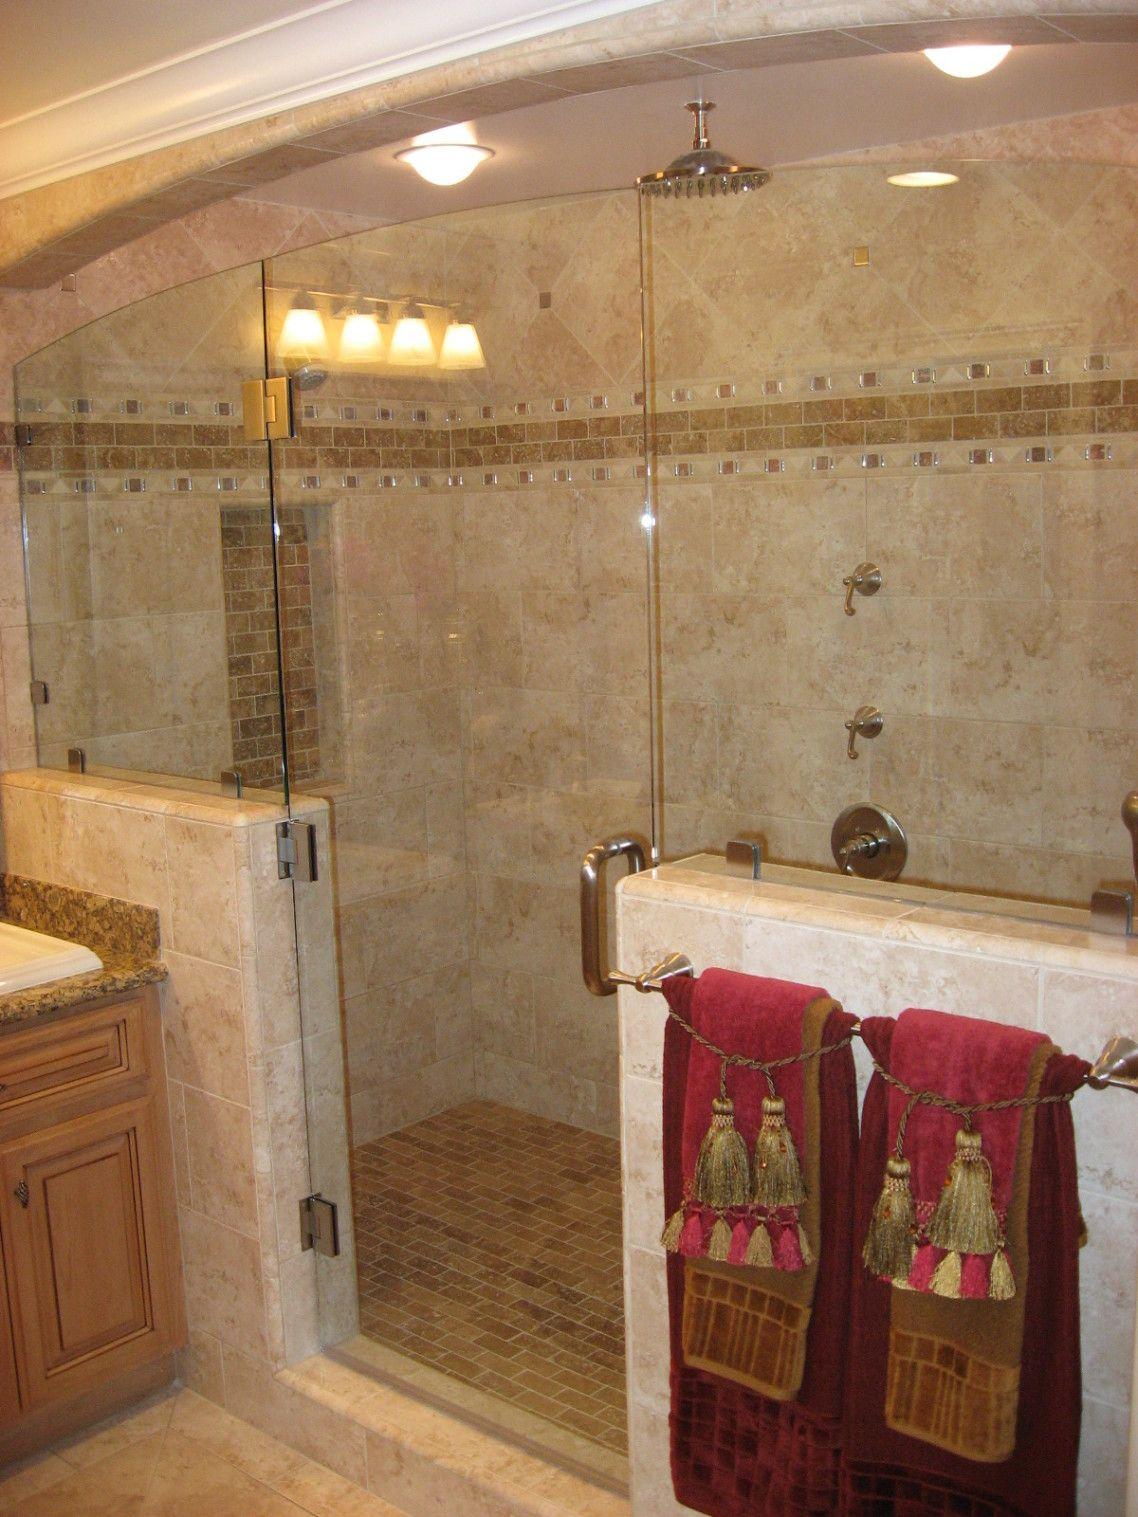 Walk In Showers No Doors Half Wall With Glass On Top Bathroom